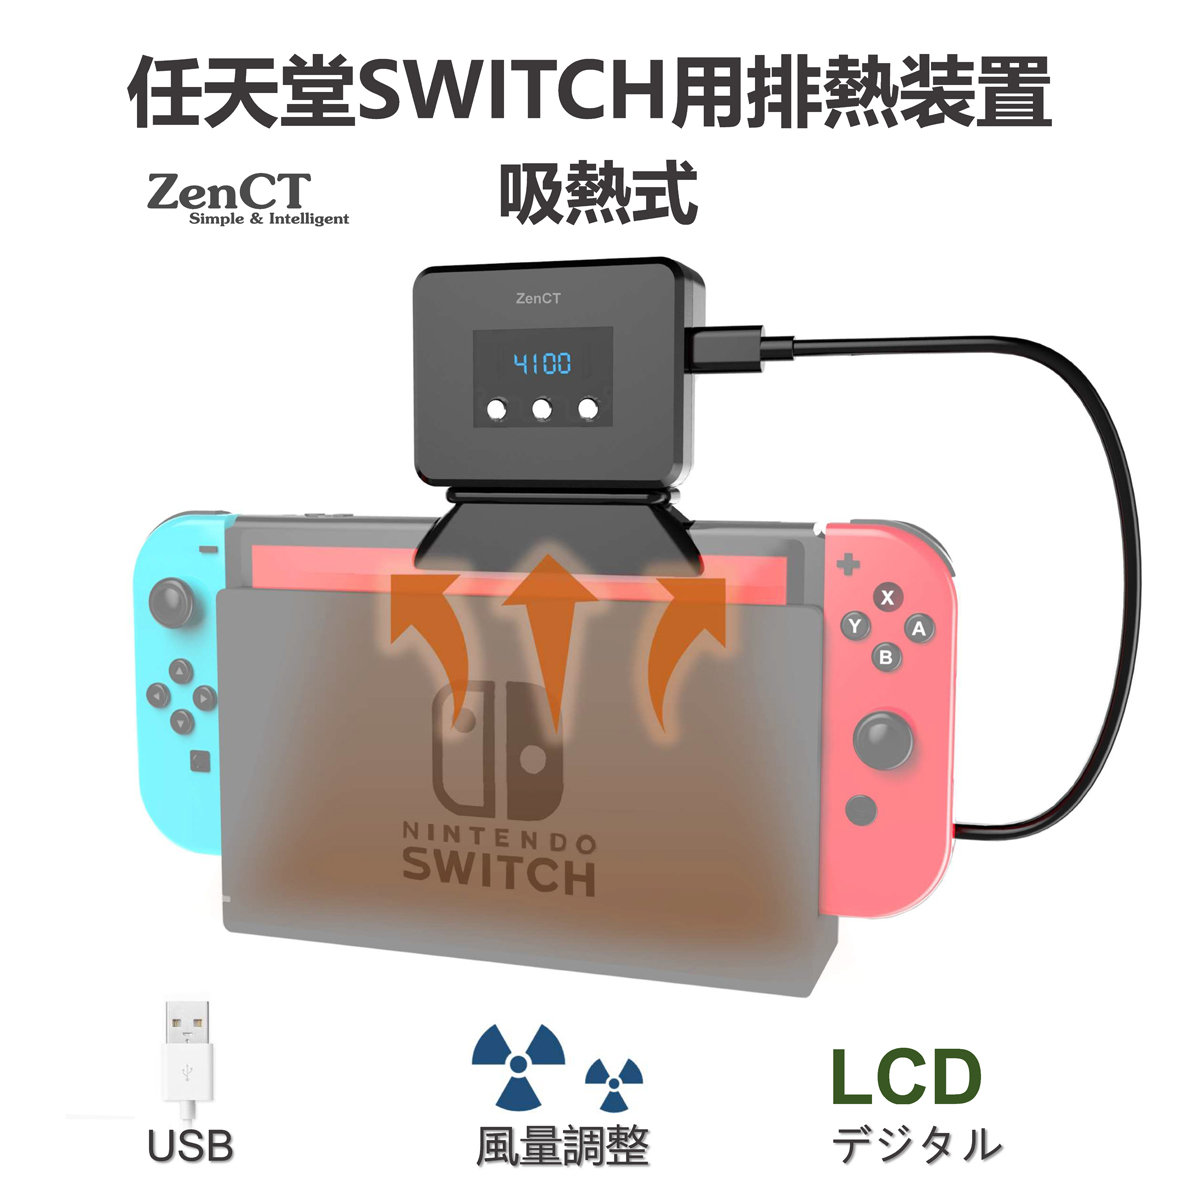 switch専用排熱装置 スイッチ お得 冷却 一年保証 ZenCT 任天堂Switch用冷却ファン 冷却器 スイッチドック 新作製品、世界最高品質人気! Nintendo Switch専用 ハイパワー冷却ファン 静音 熱対策 CT064